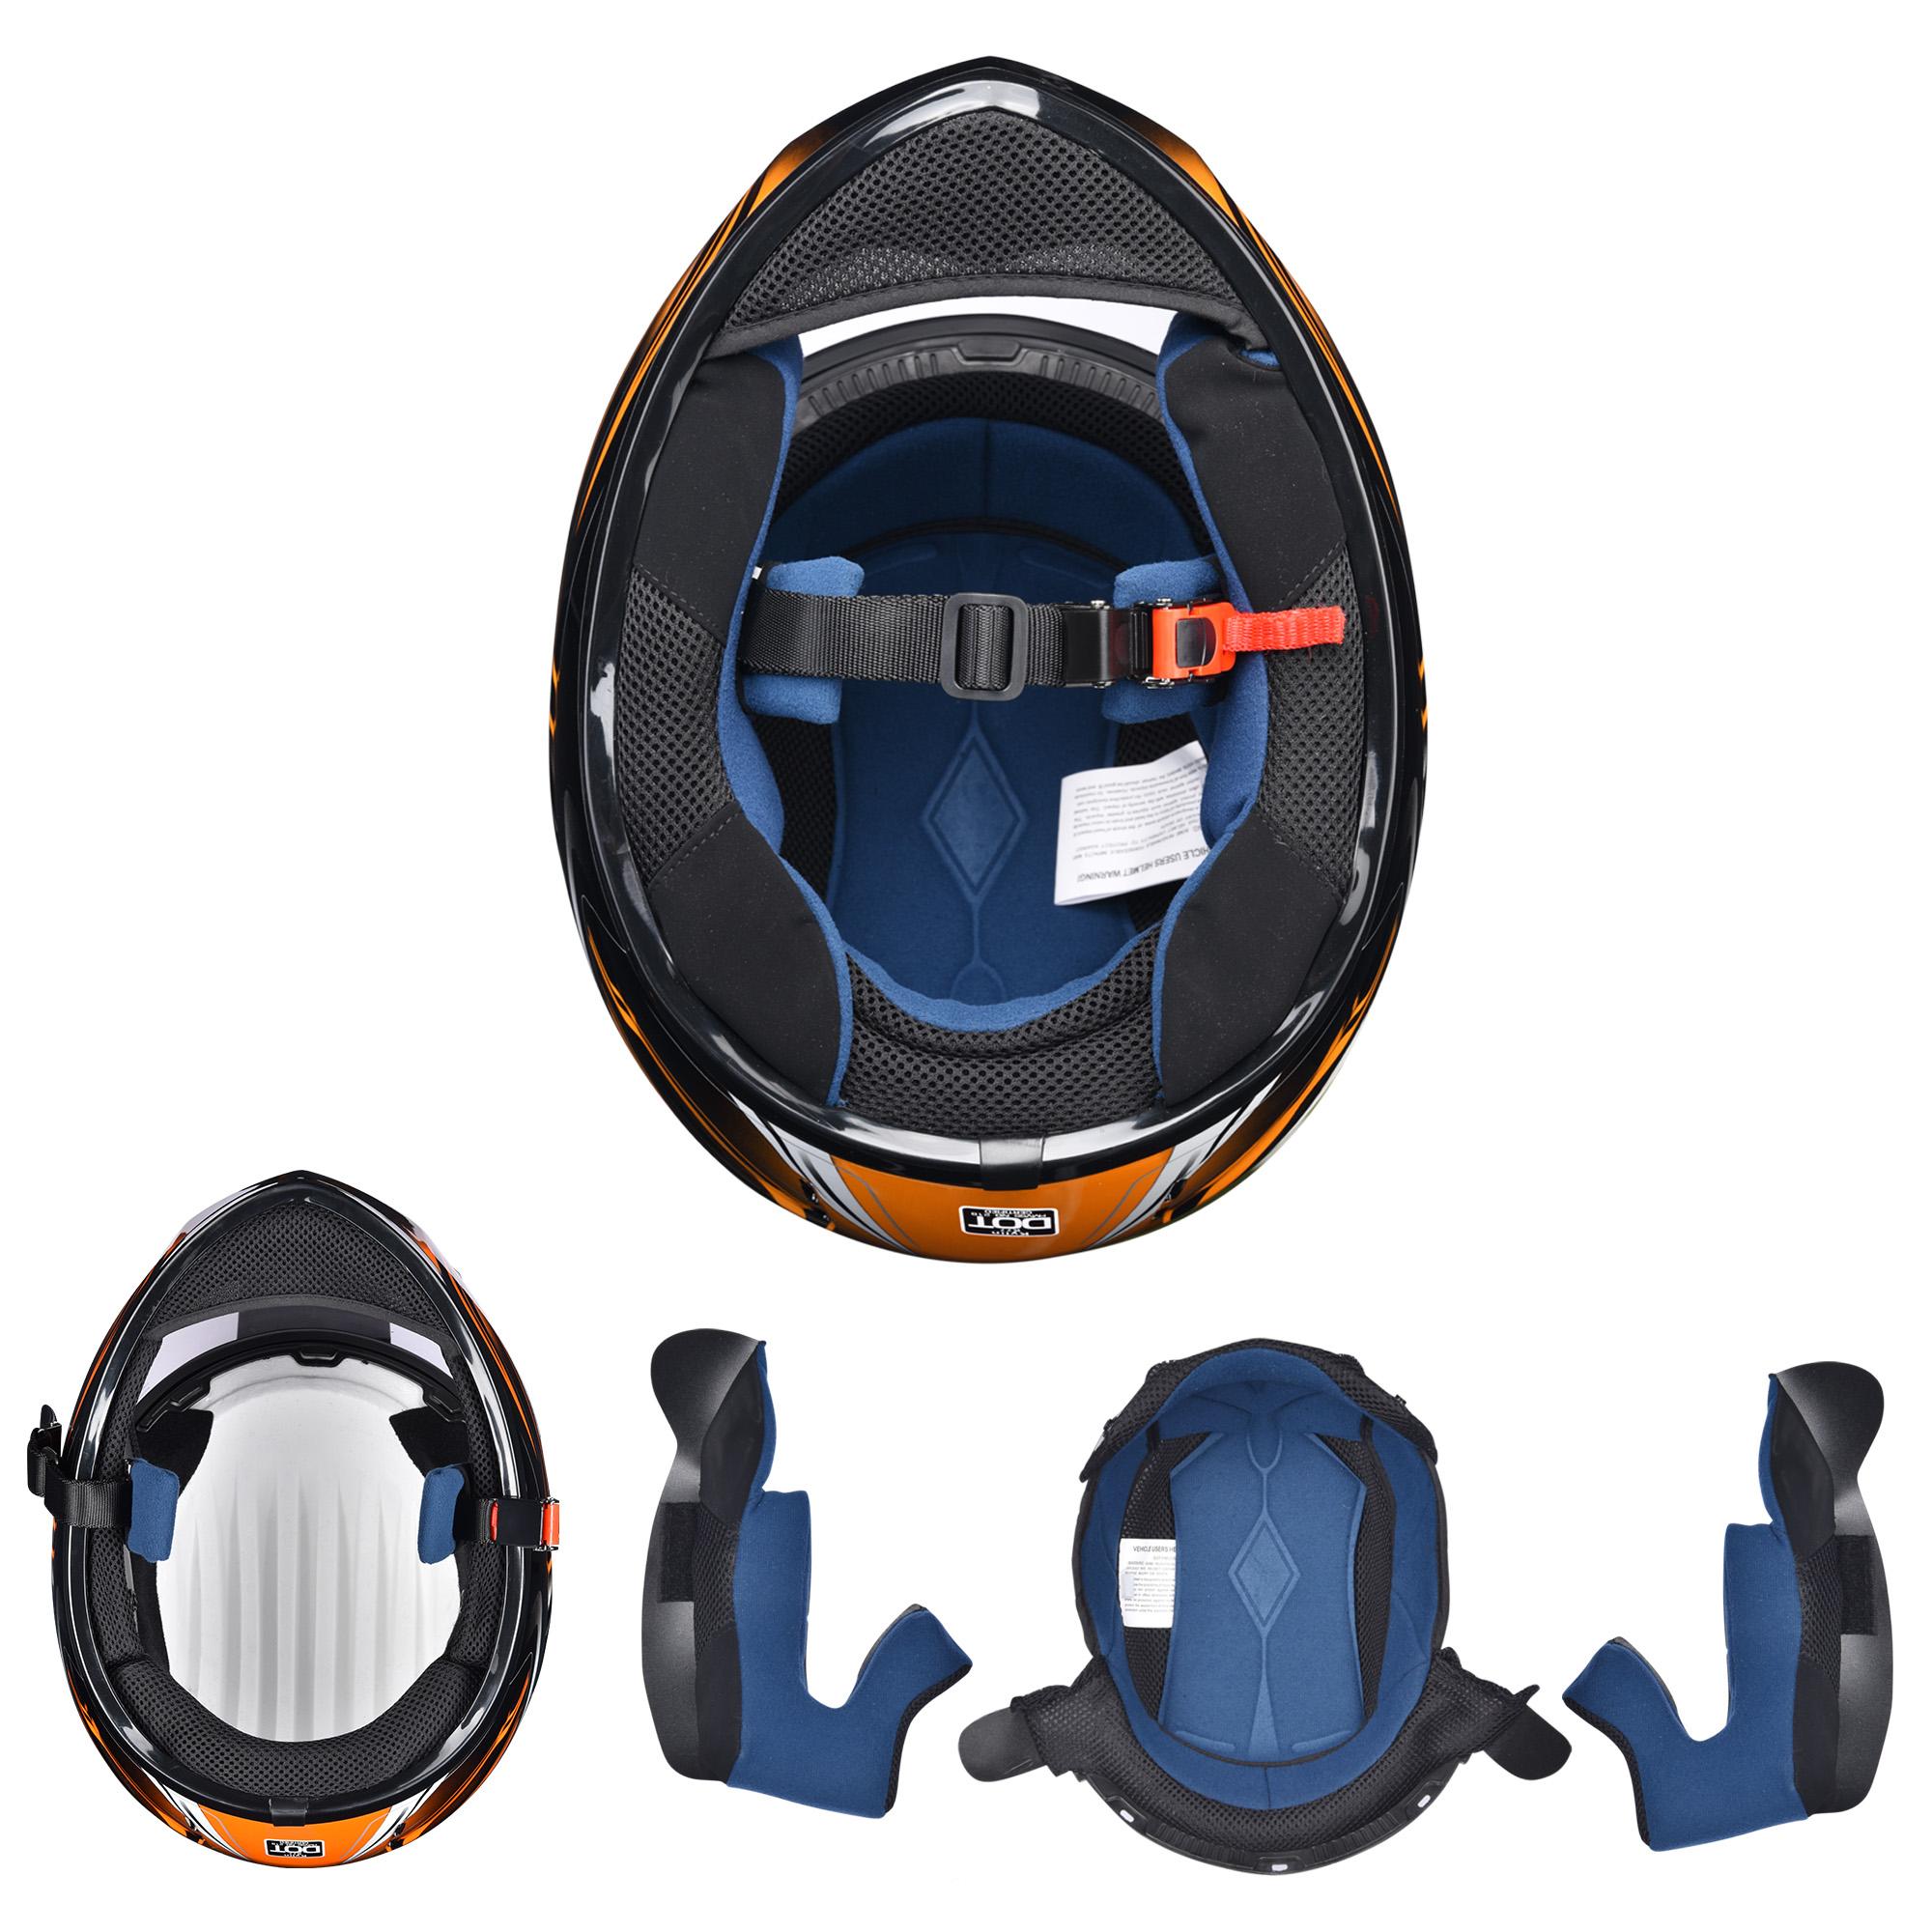 miniature 117 - AHR K12 Full Face Motorcycle Helmet DOT Air Vents Clear Visor Racing S M L XL